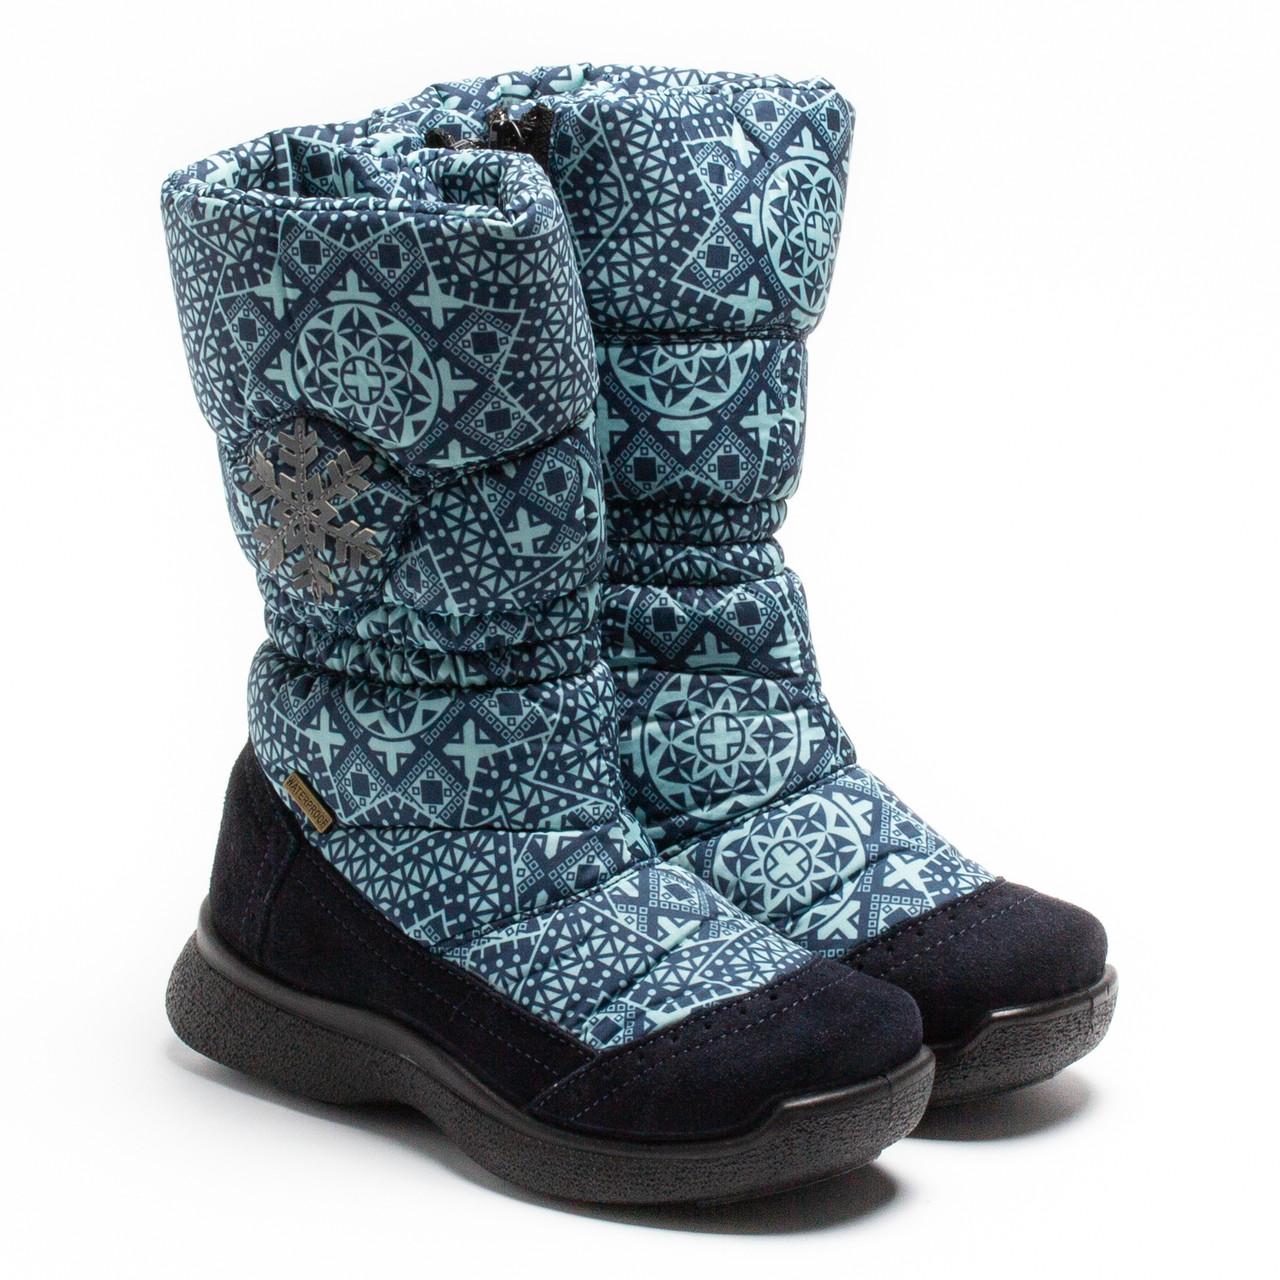 Зимние сапожки Тигина, для девочки, на молнии, размер 28-35